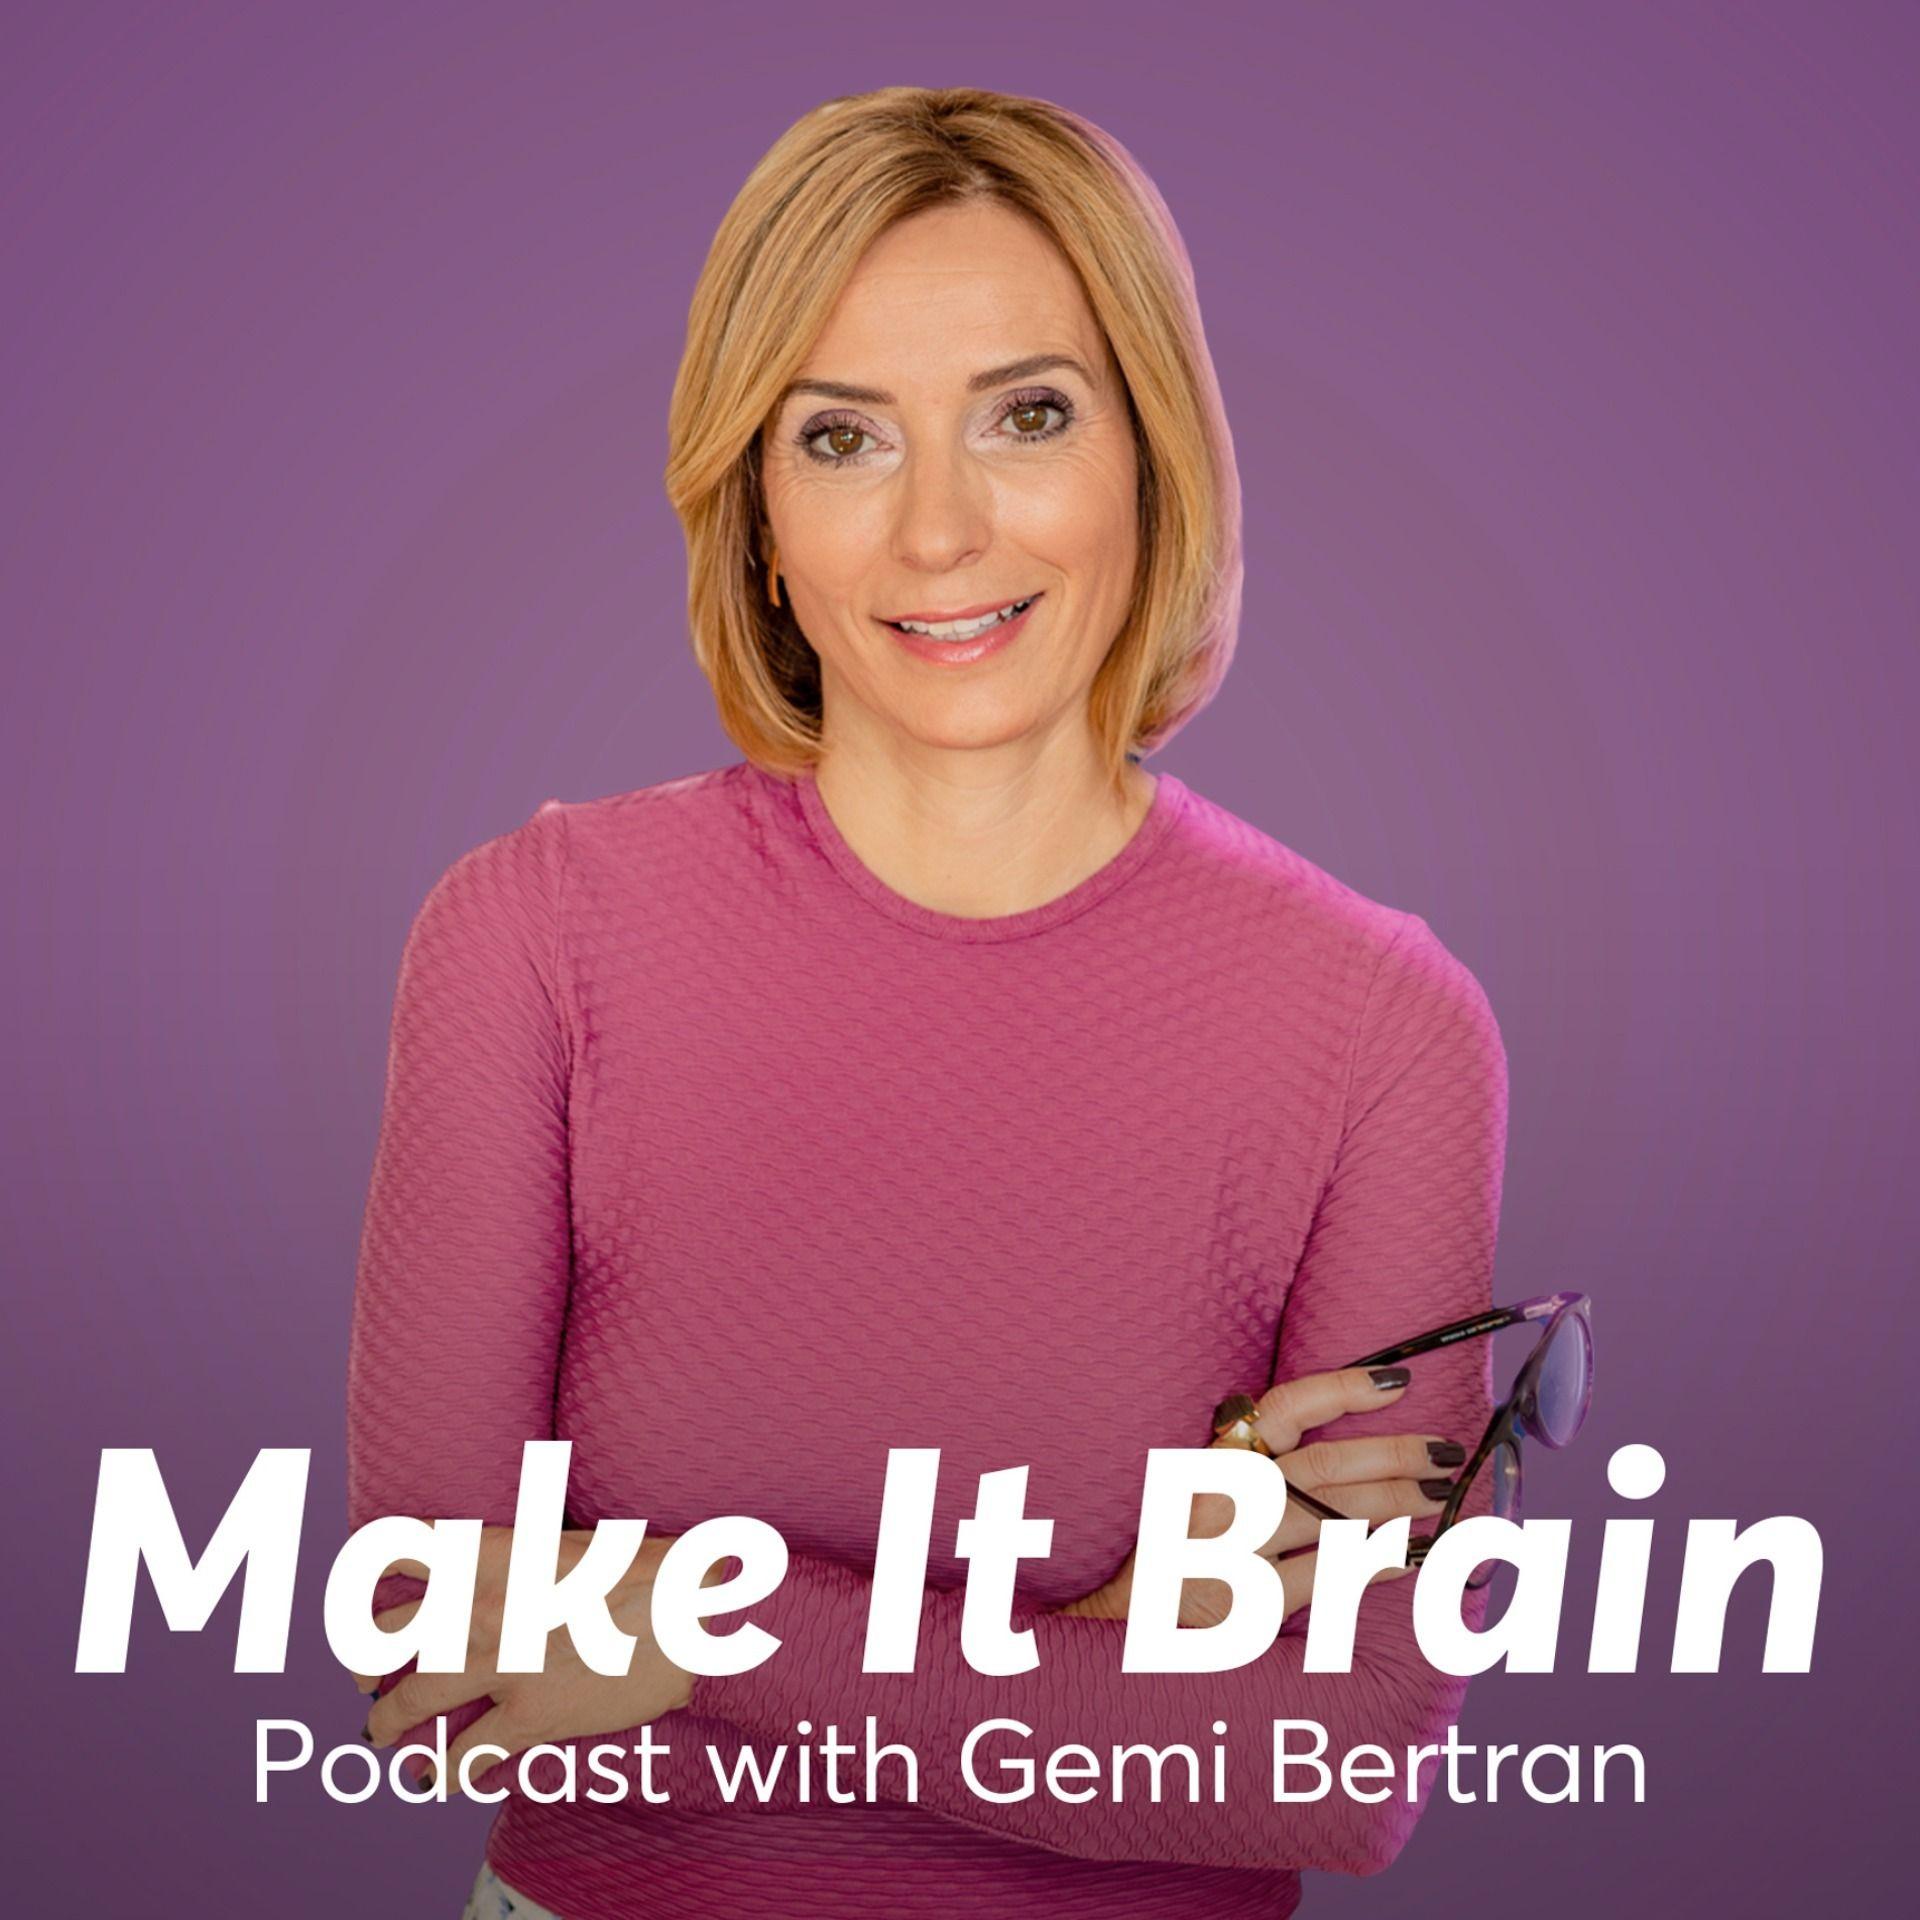 Make it Brain